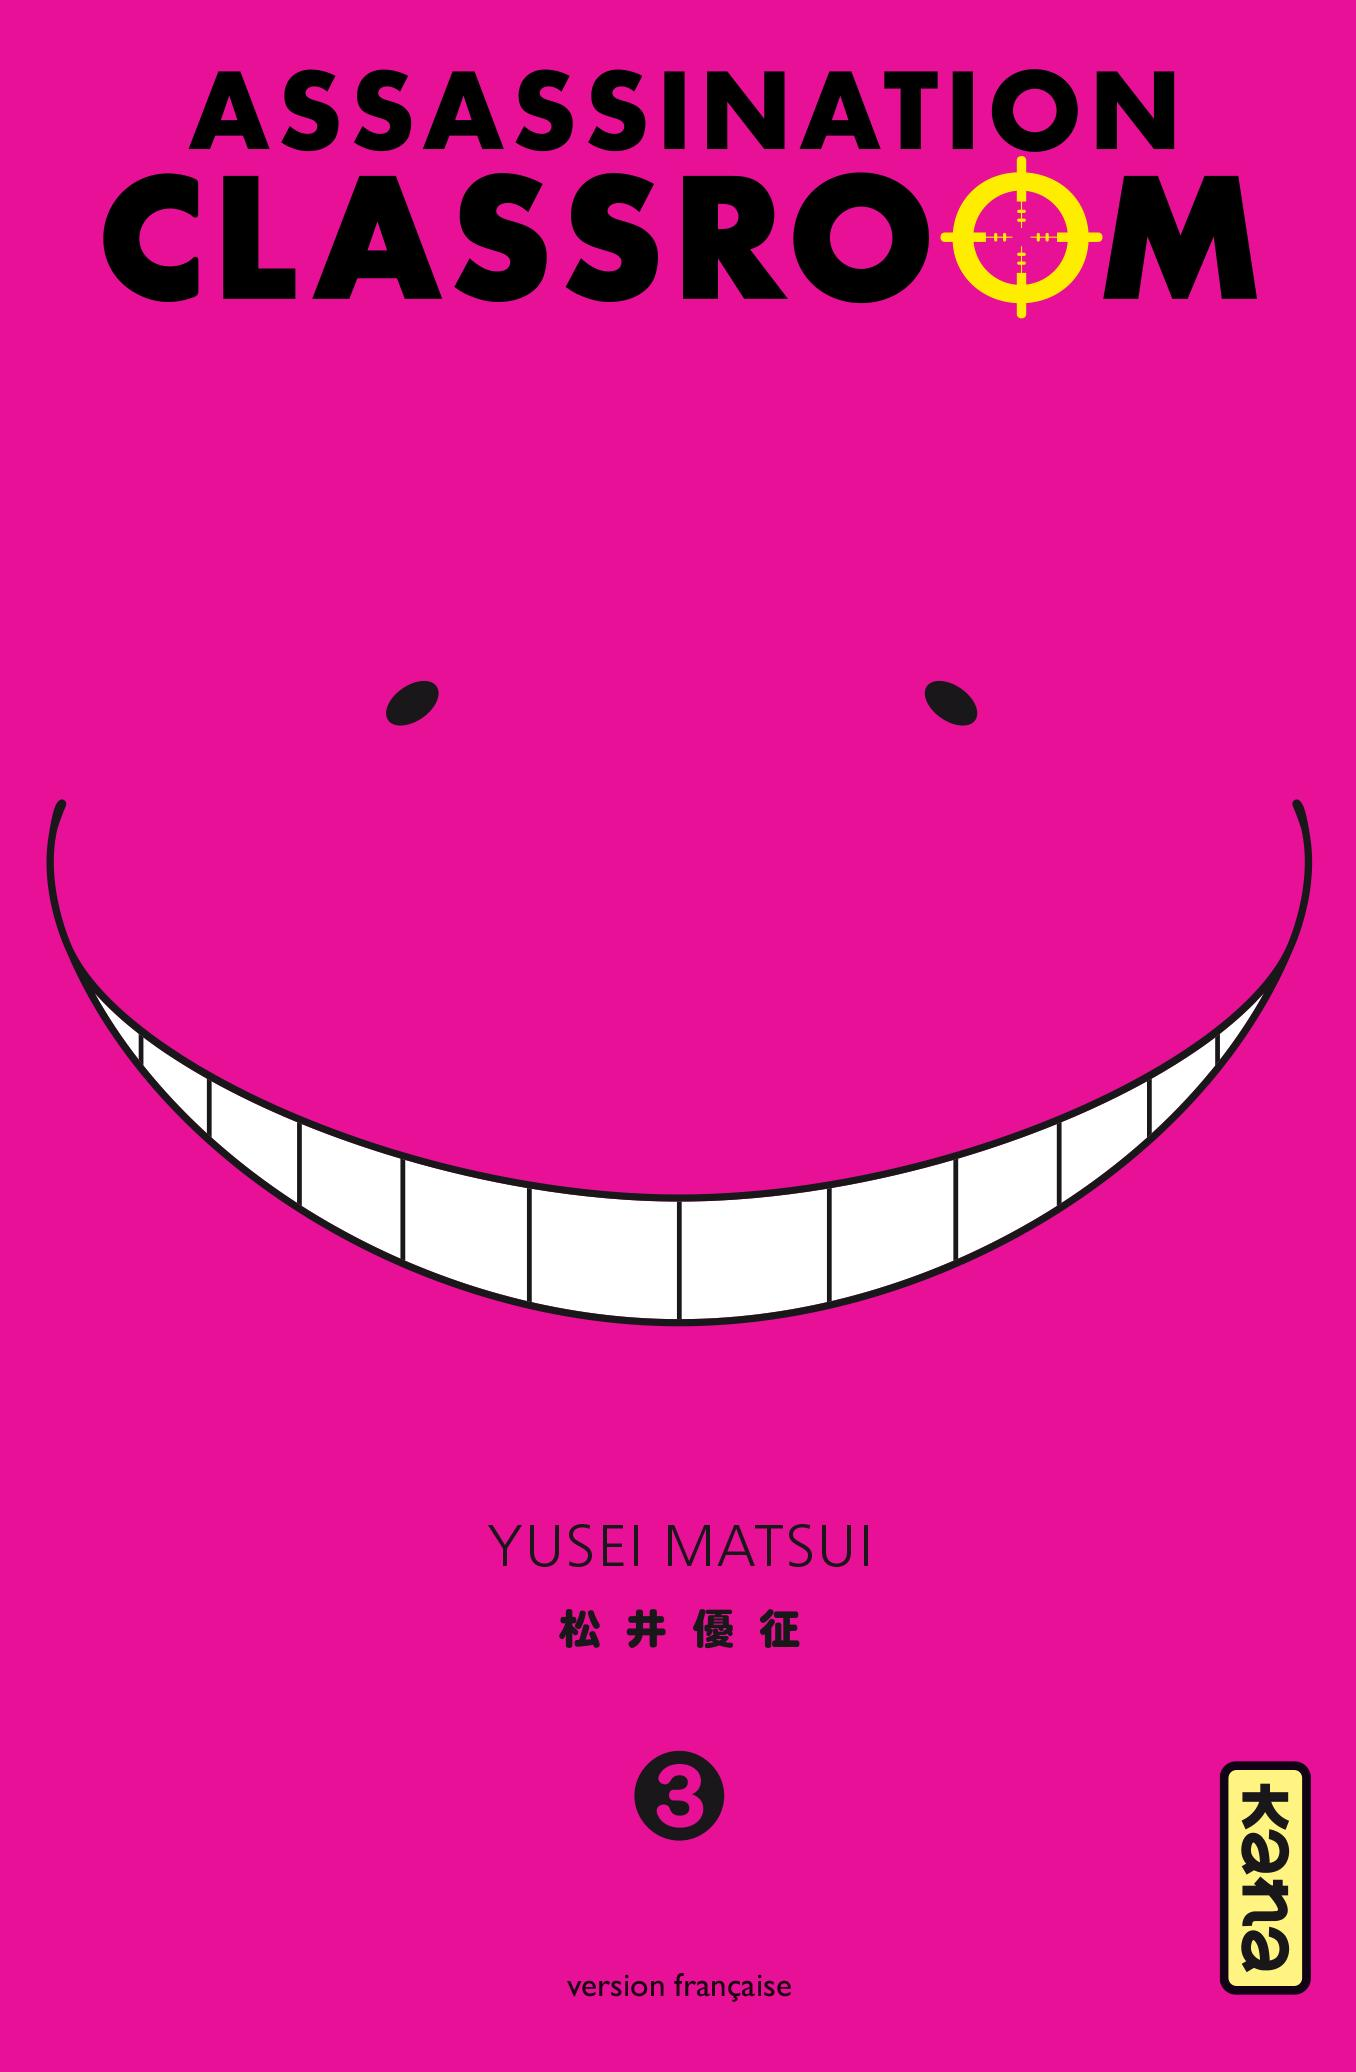 http://img.manga-sanctuary.com/big/assassination-classroom-manga-volume-3-simple-76698.jpg